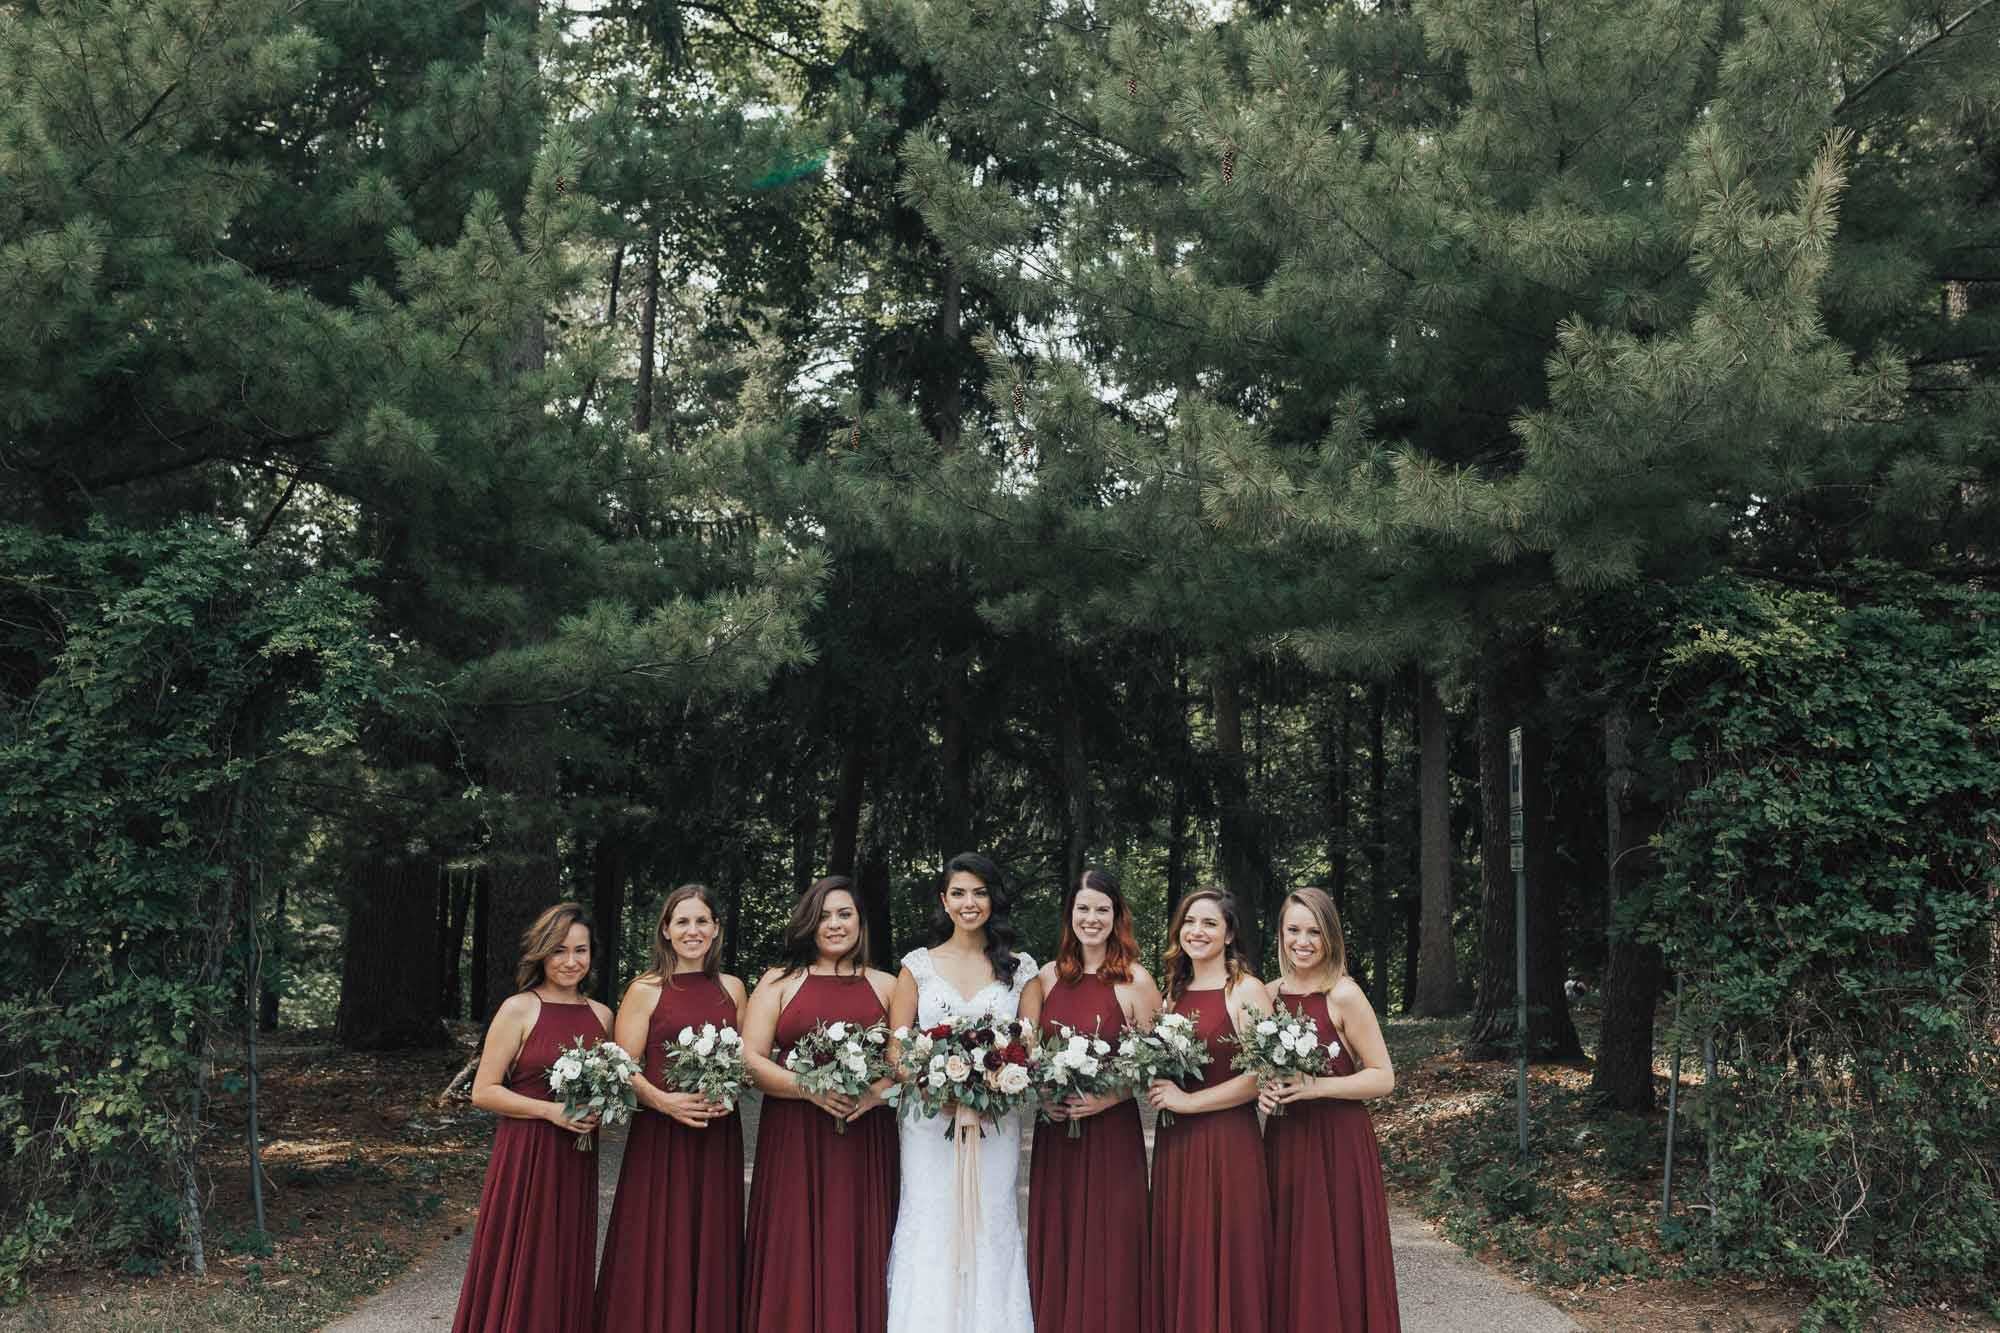 champaign_il_wedding_photography-0221.jpg